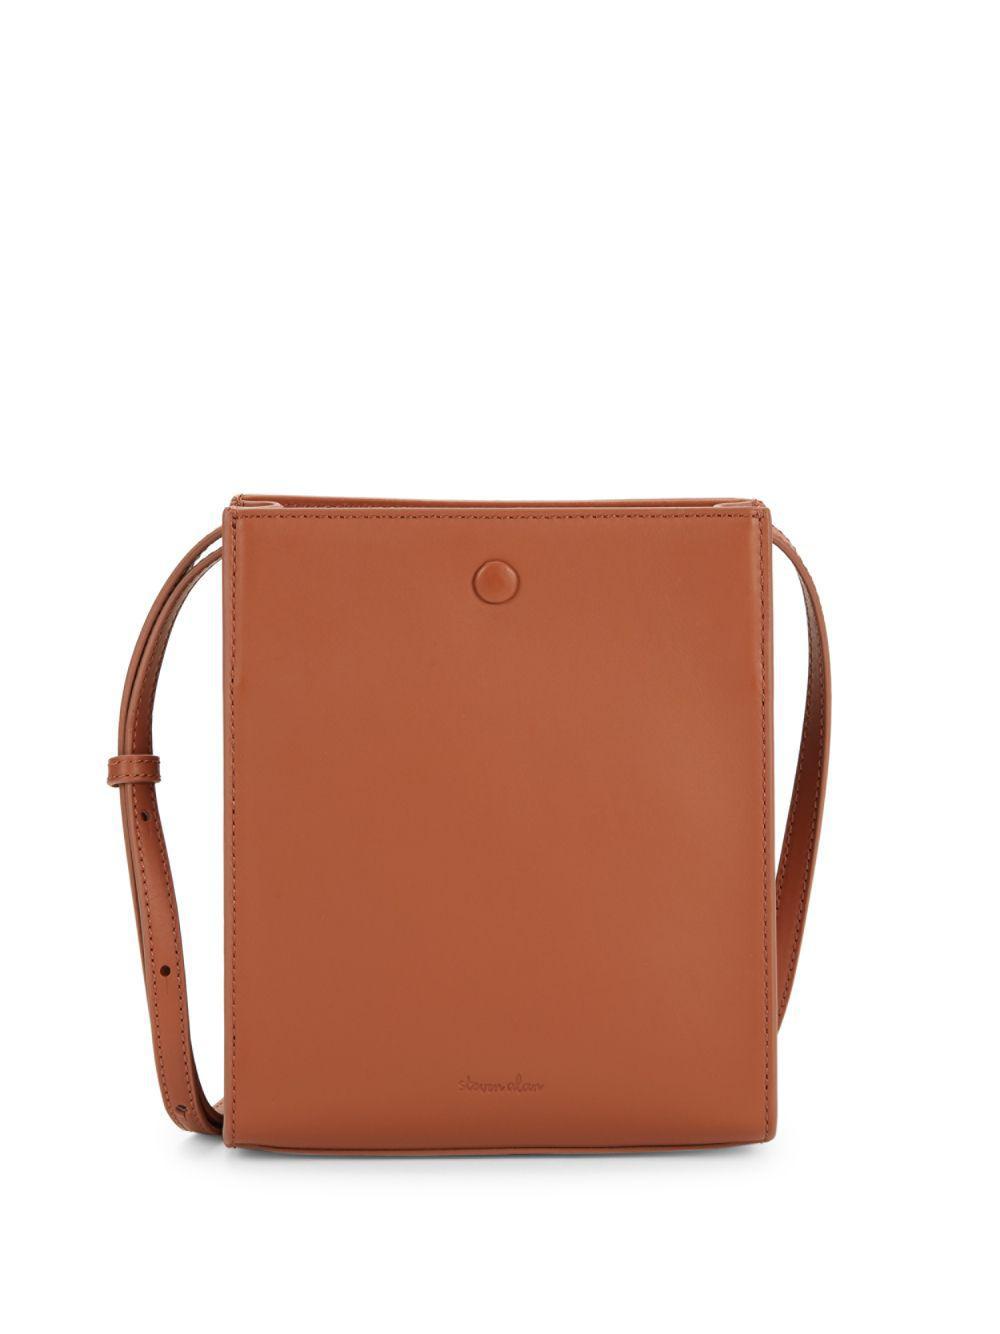 ec0b3447511 Steven Alan Camden Metallic Leather Crossbody Bag in Brown - Lyst